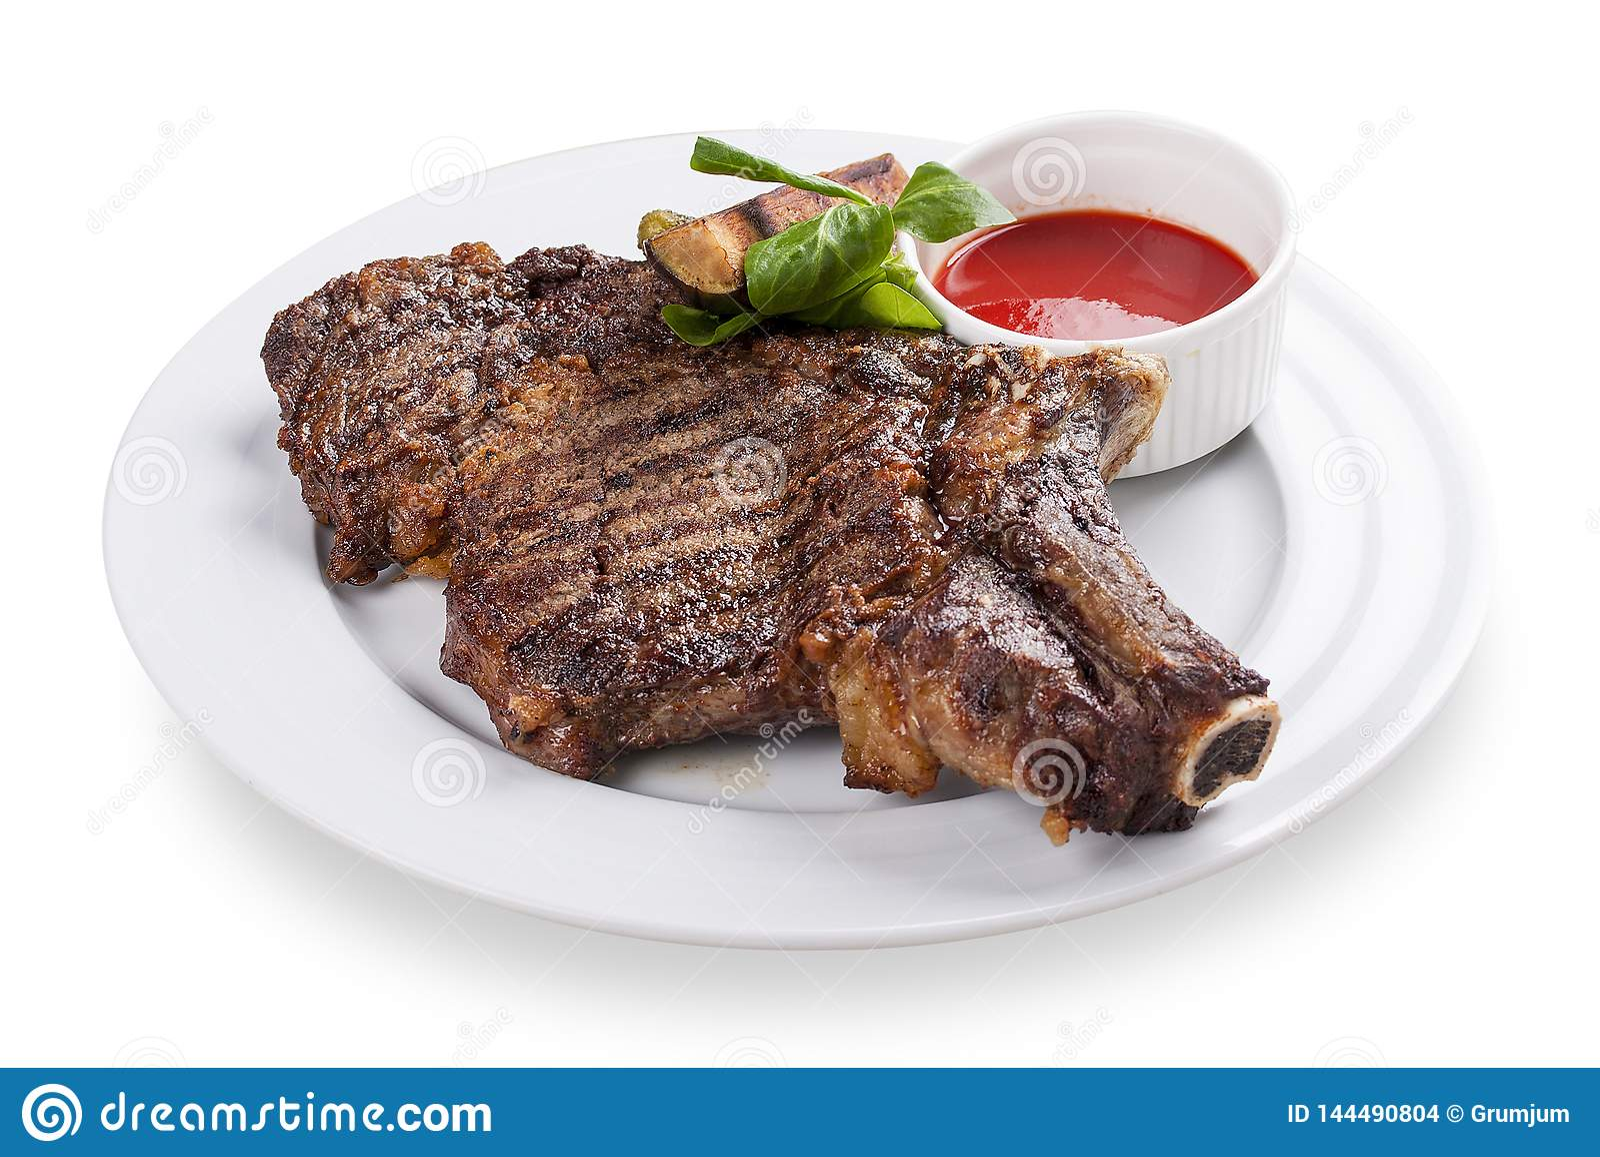 Veal steak on the bone.